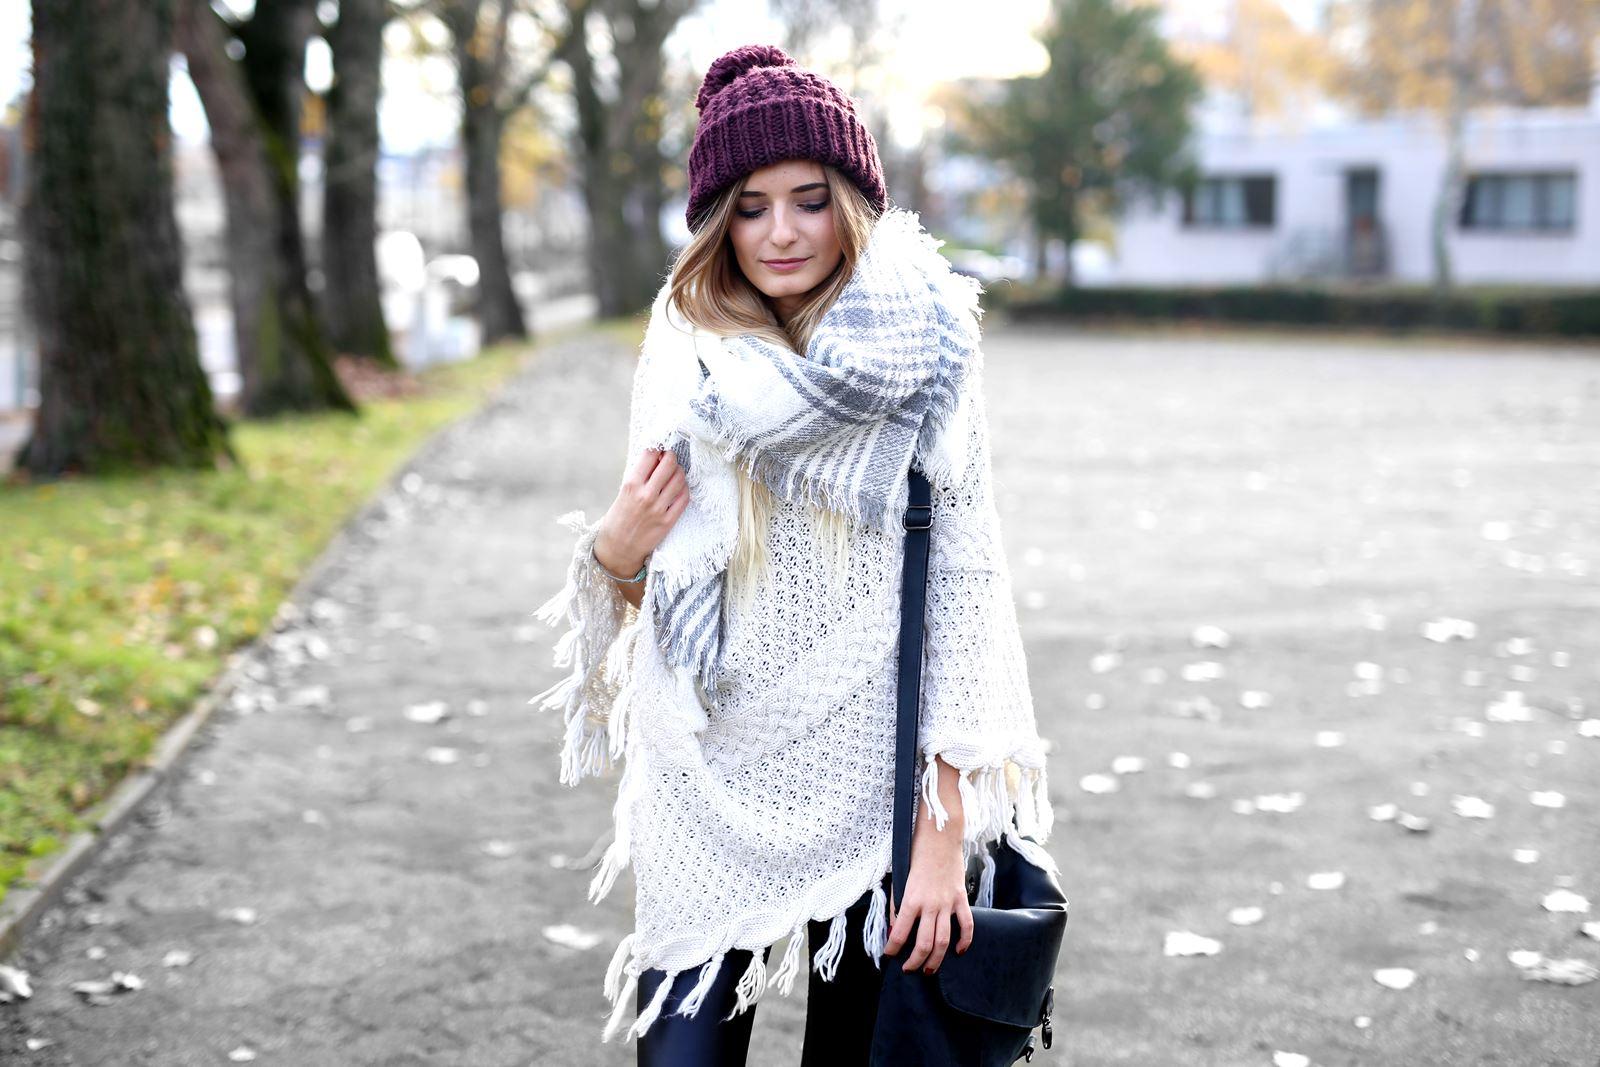 modeblog-german-fashion-blog-herbst-outfit-poncho-xxl-schal-4